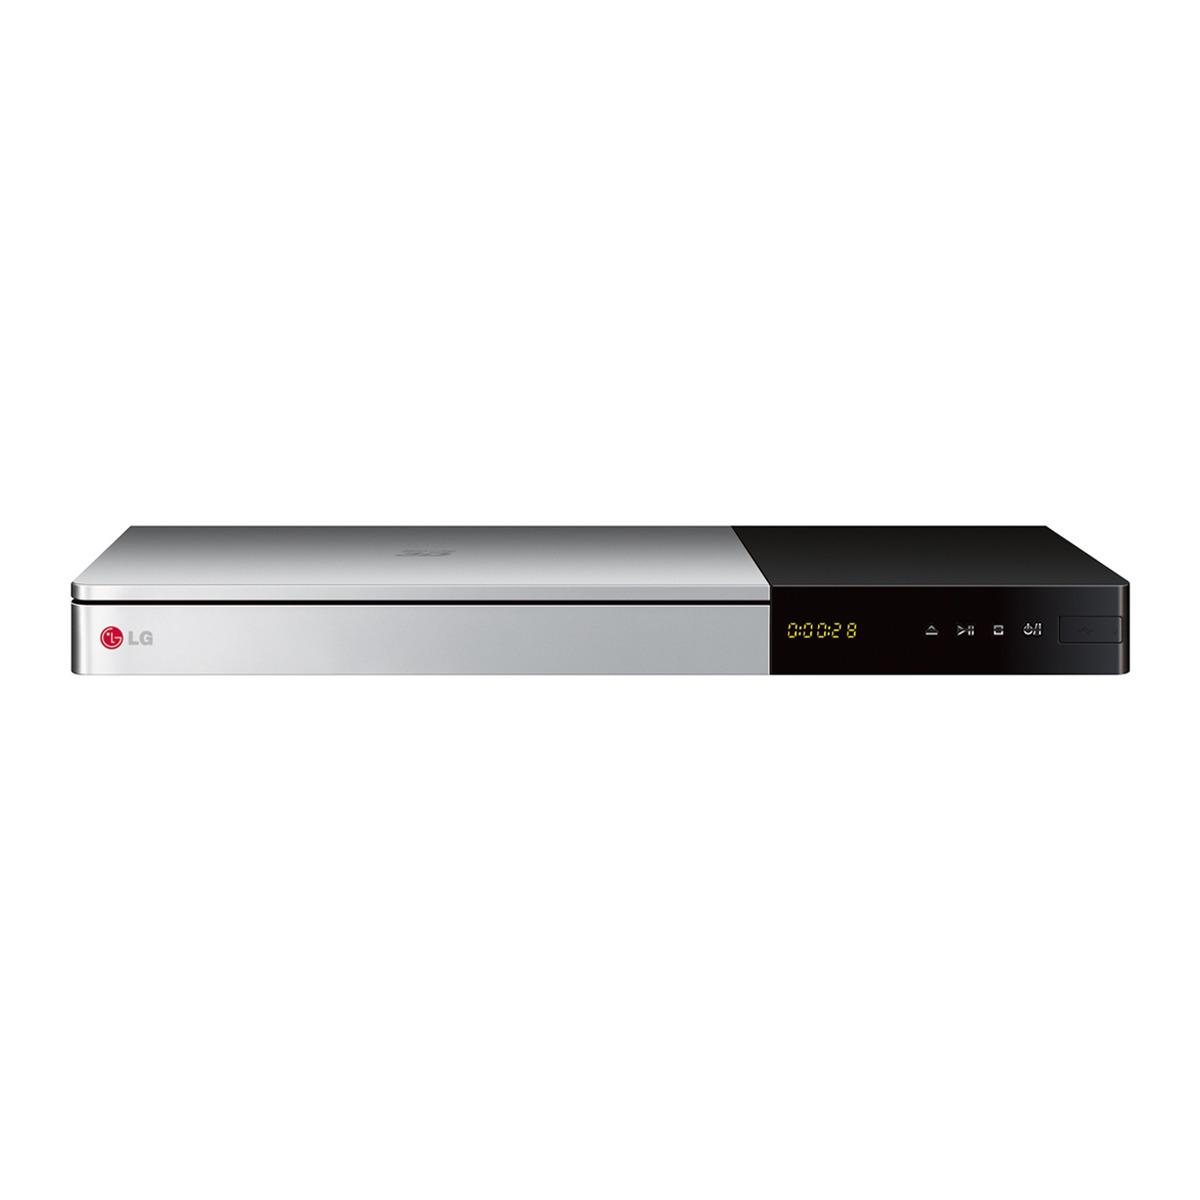 Reproductor Blu-Ray LG BP740 Escalado UHD